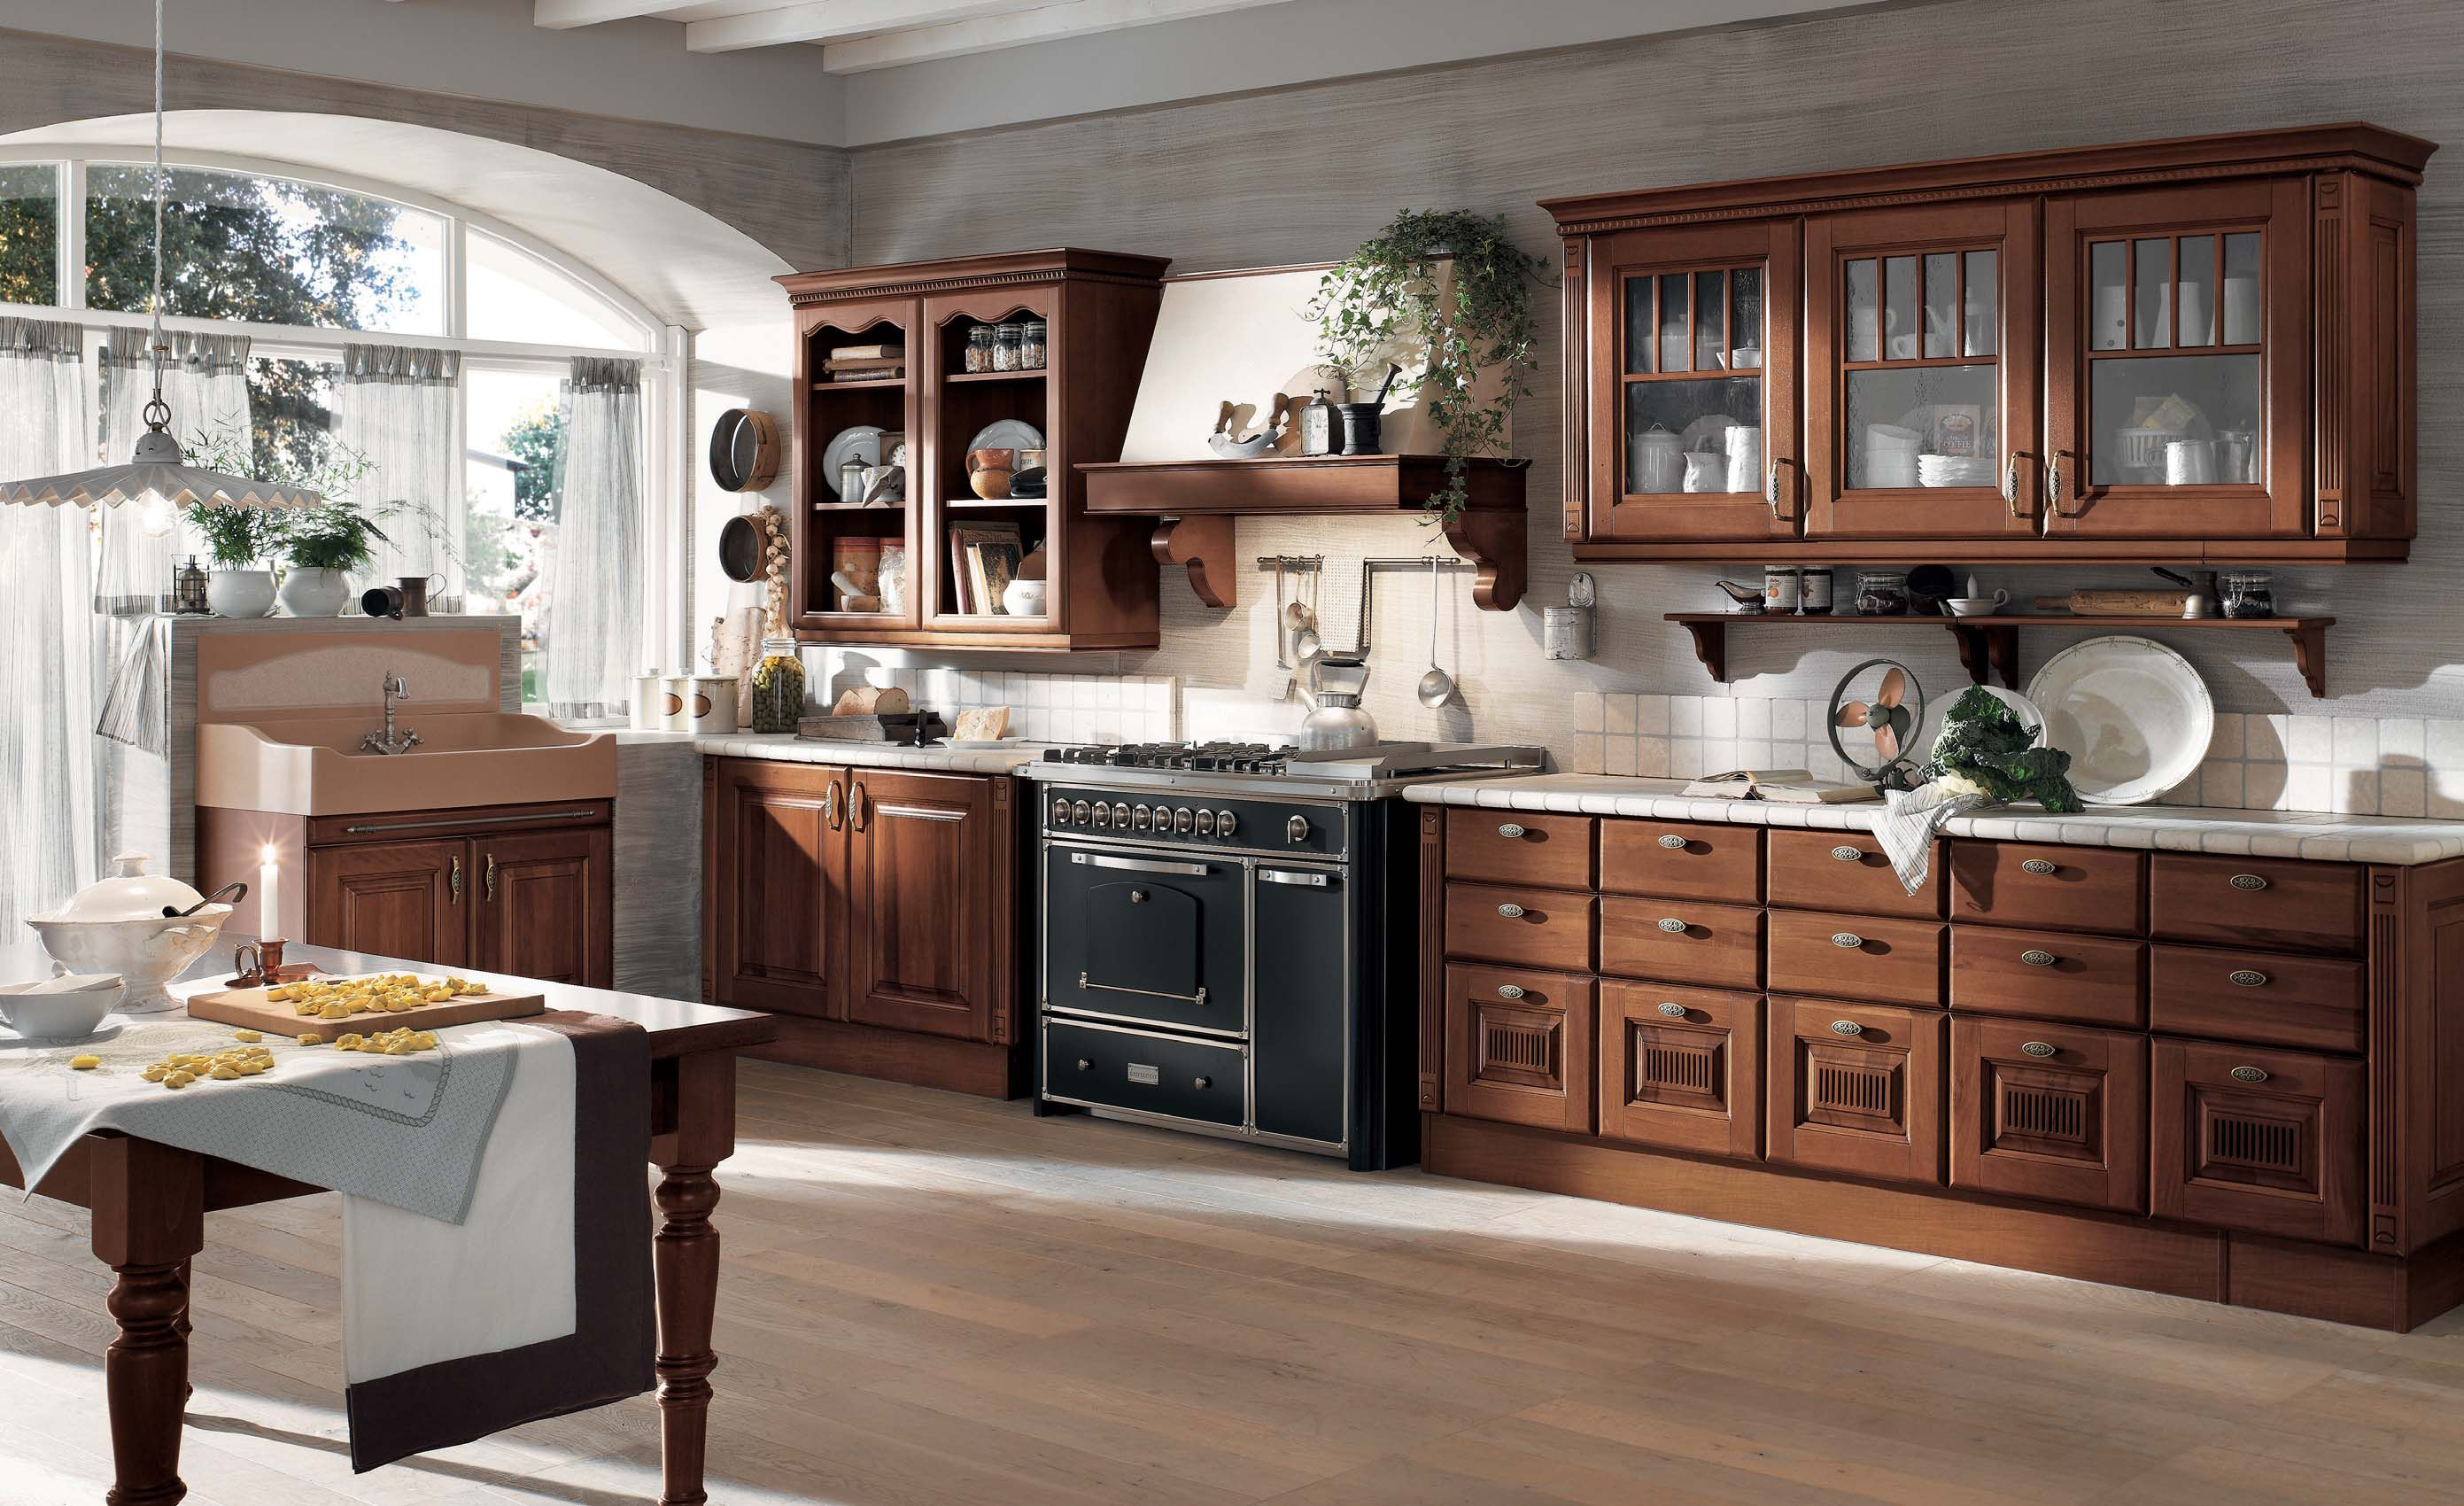 glass door cabinets open shelf cabinets classic wood kitchen design 10 modern kitchen design on kitchen remodel ideas id=35678